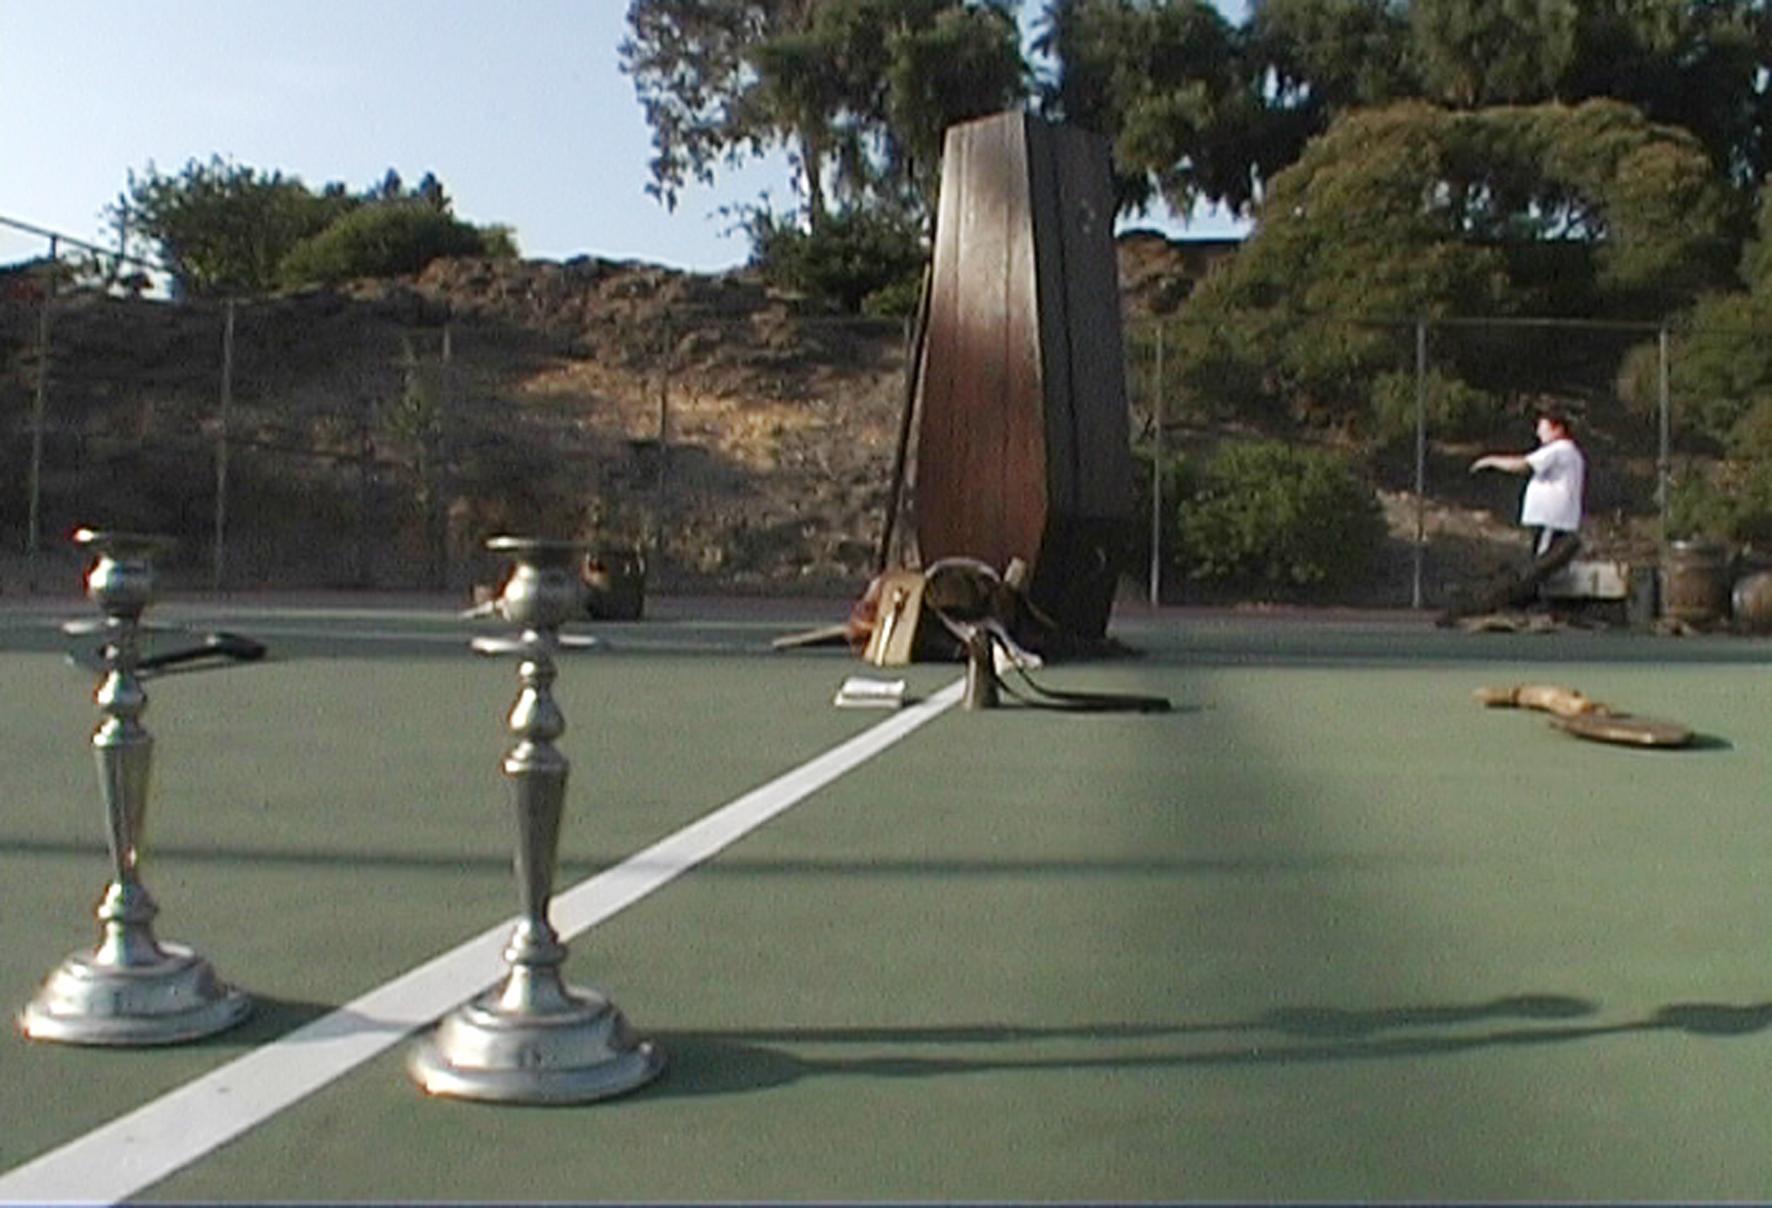 Catherine Sullivan, The Little Hunt,  2002,video still from a single-chanel vidéo, color, no sound, 15 min 30 sec